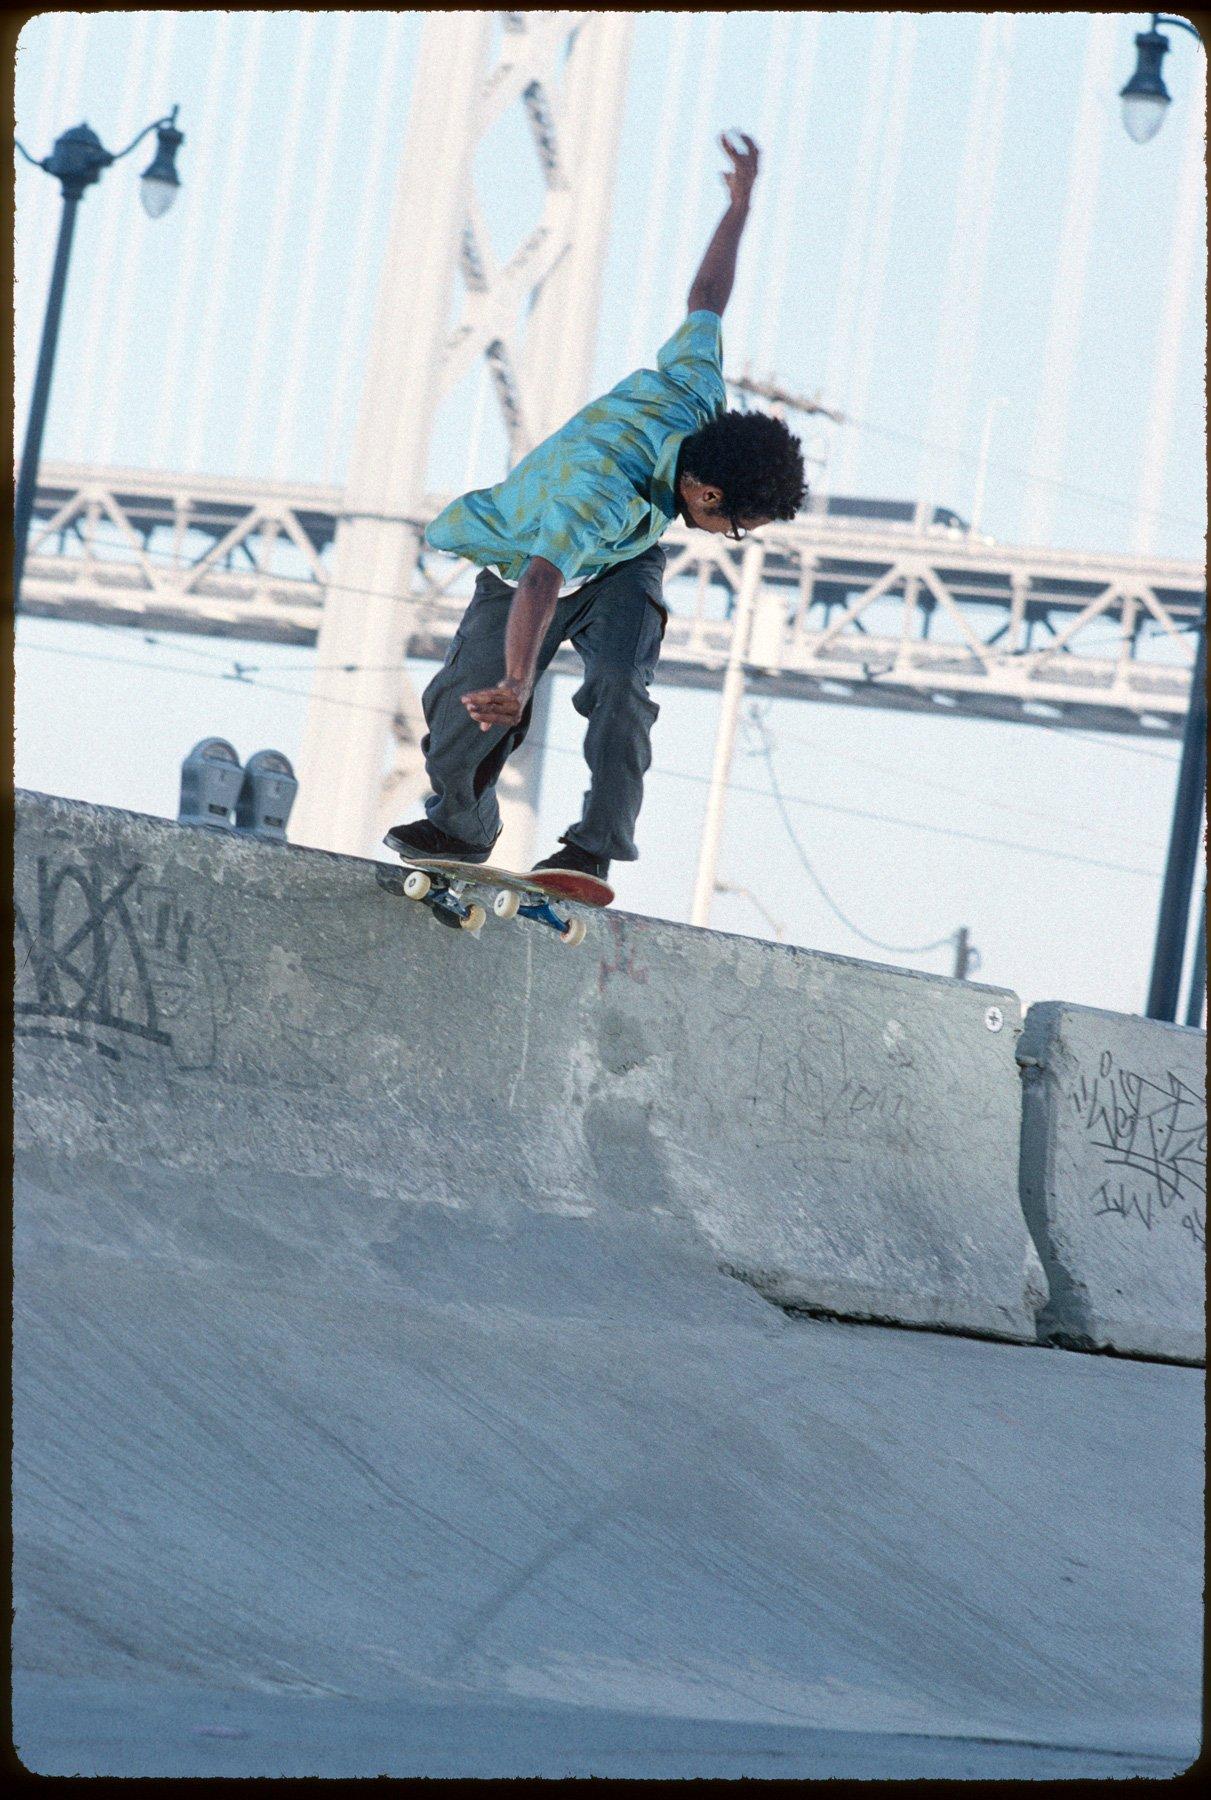 Image of Chris Pastras, San Francisco 1997, by Tobin Yelland